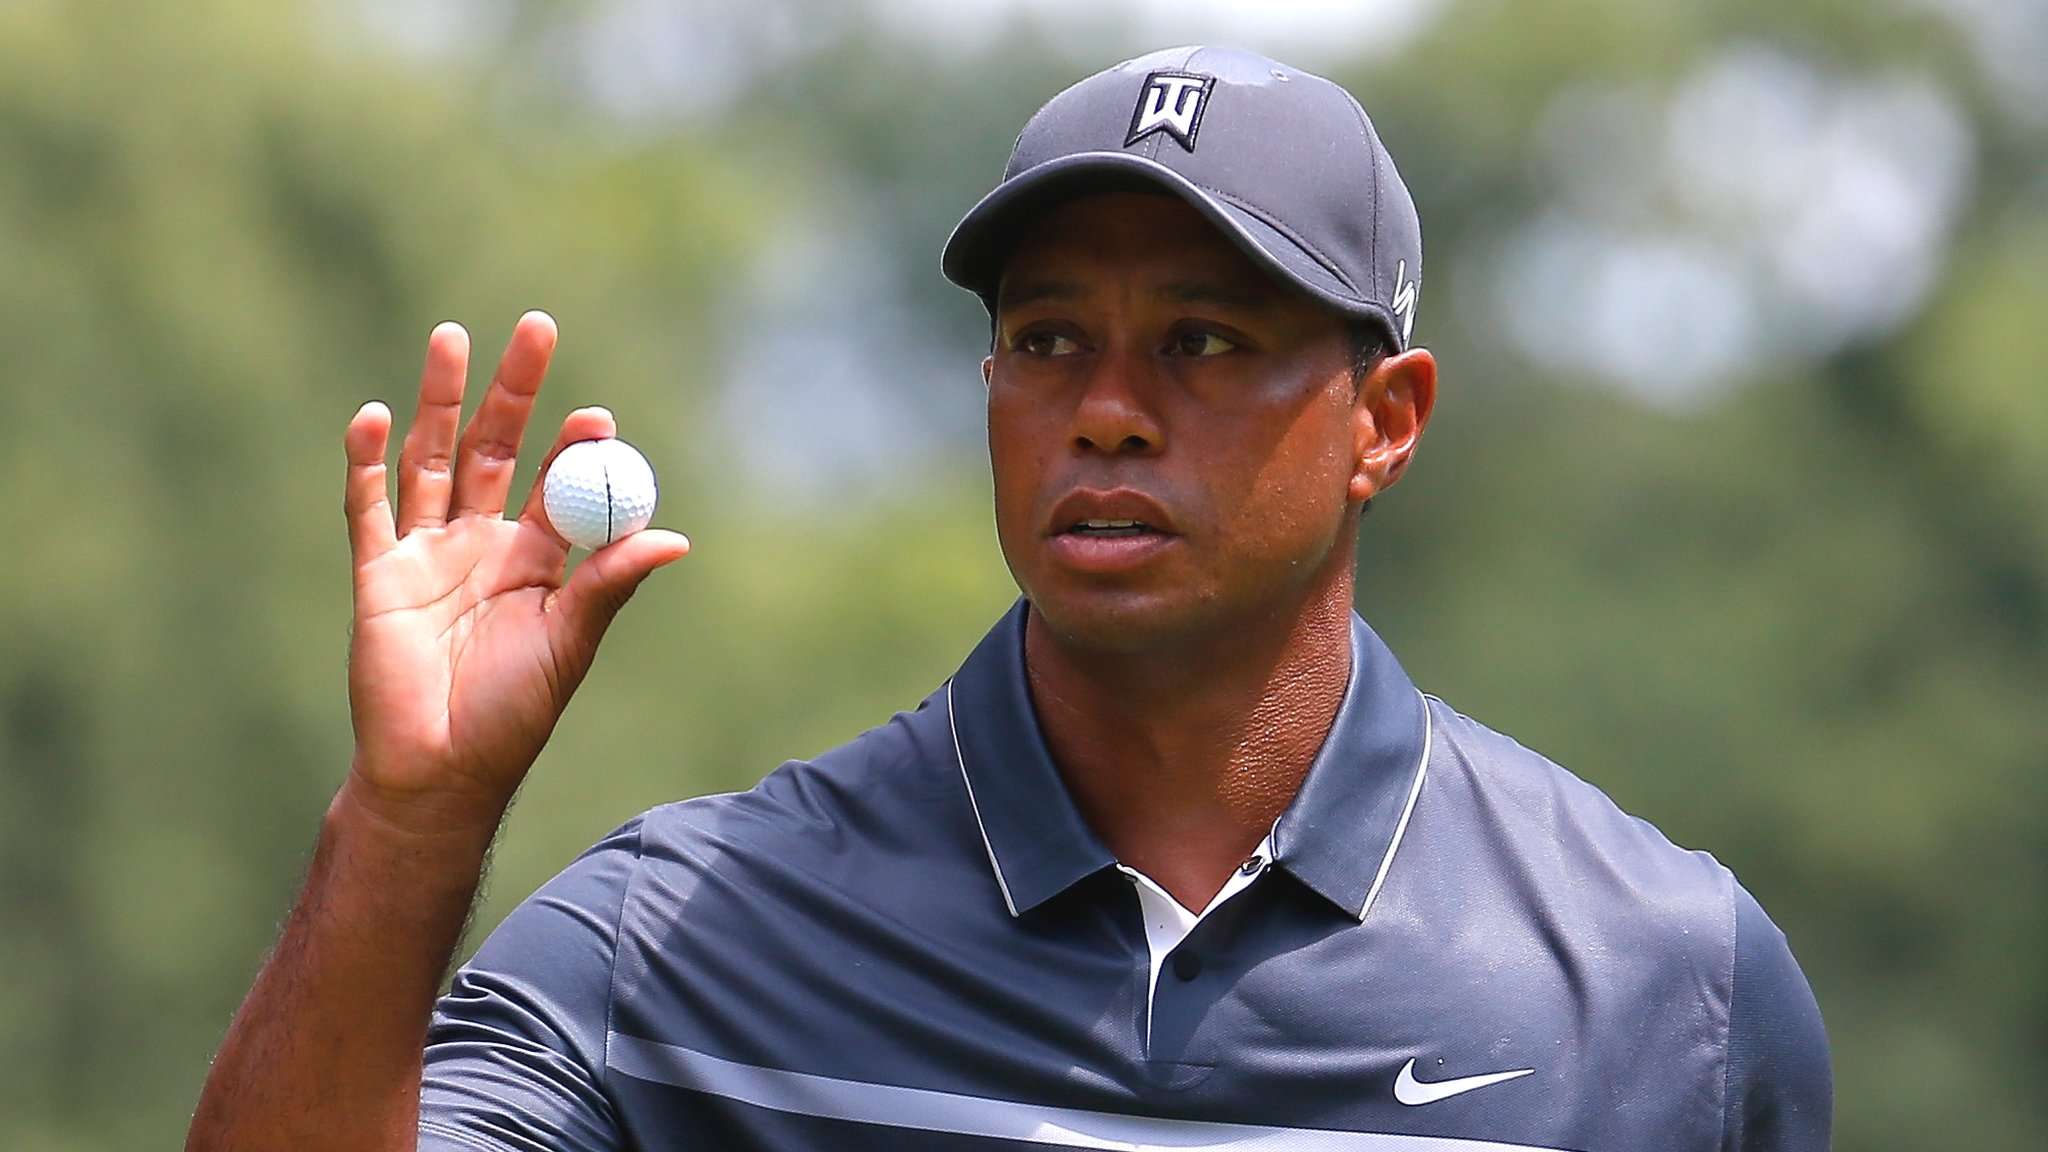 Tiger Woods confident of bettering Jack Nicklaus' 18 major wins